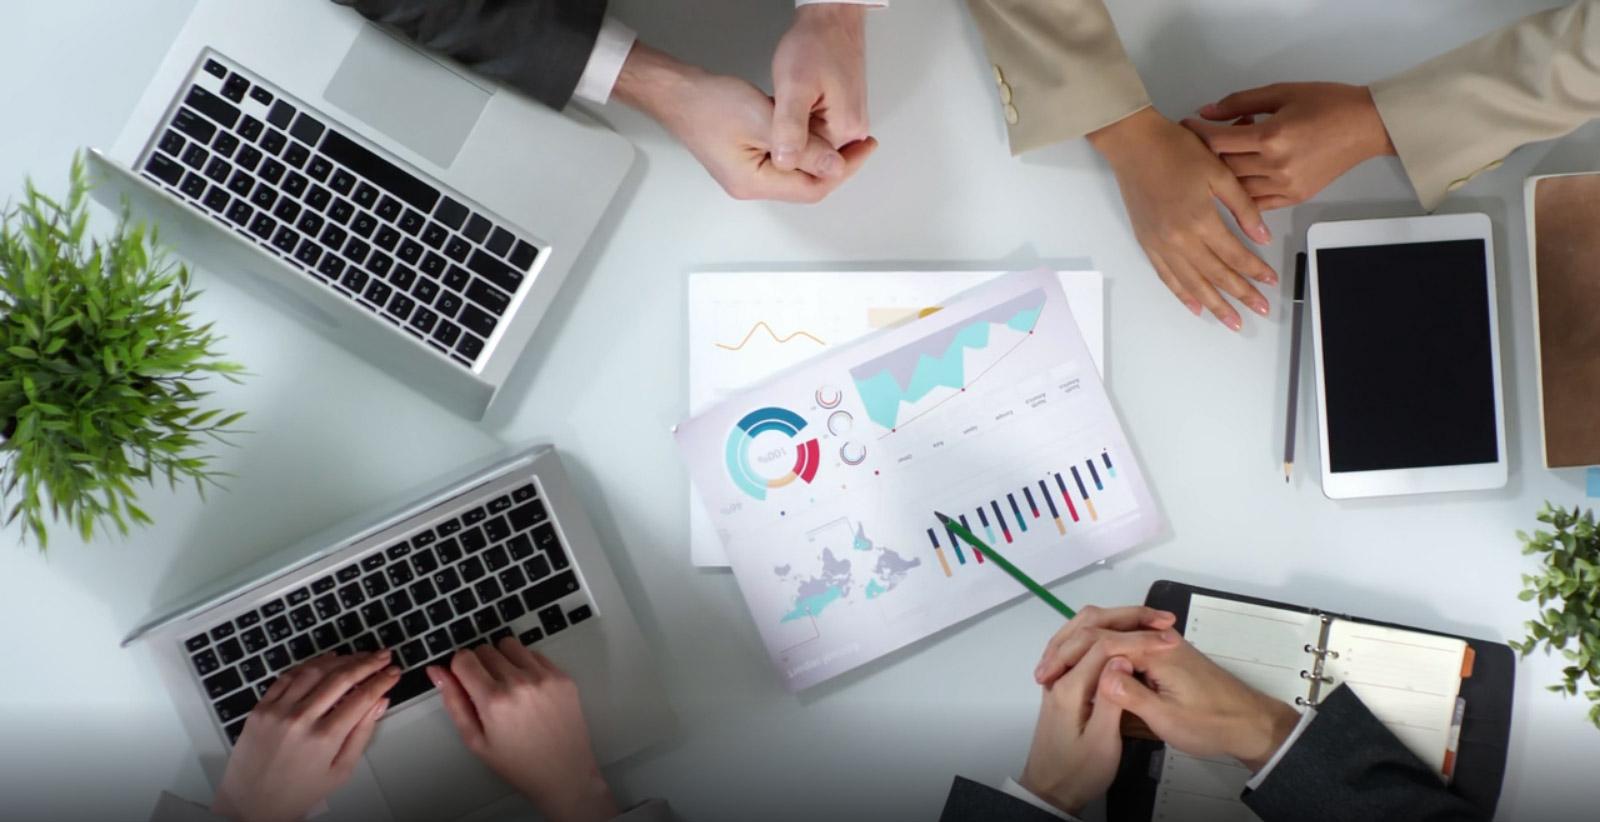 Siti Web, Ecommerce, Digital Marketing